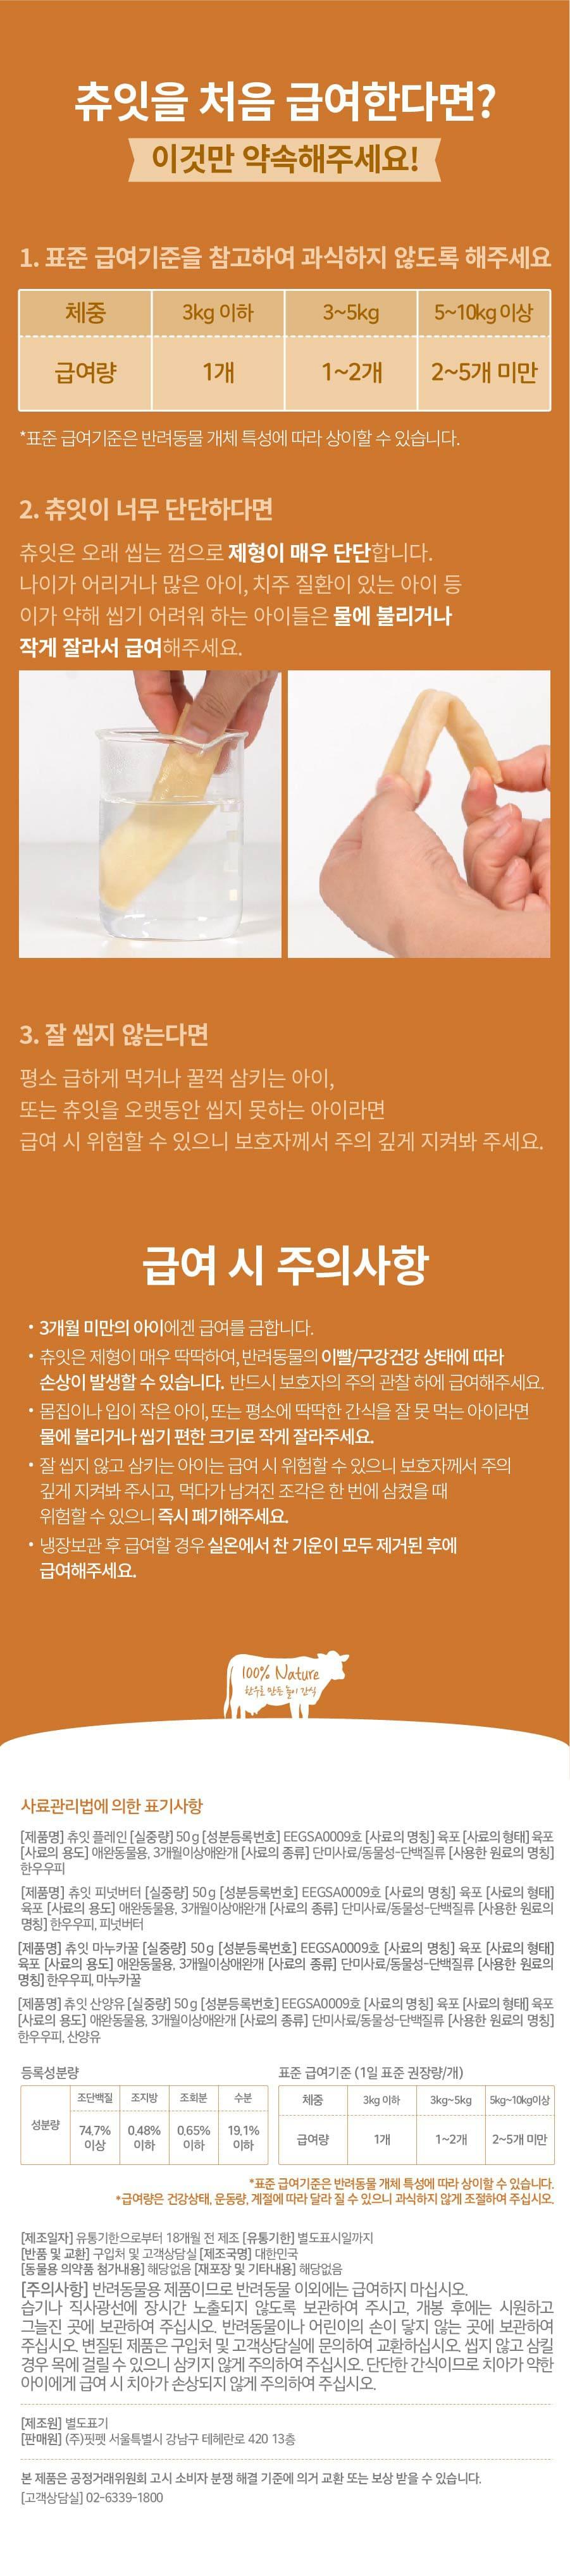 [EVENT] 츄잇 플레인-상품이미지-34